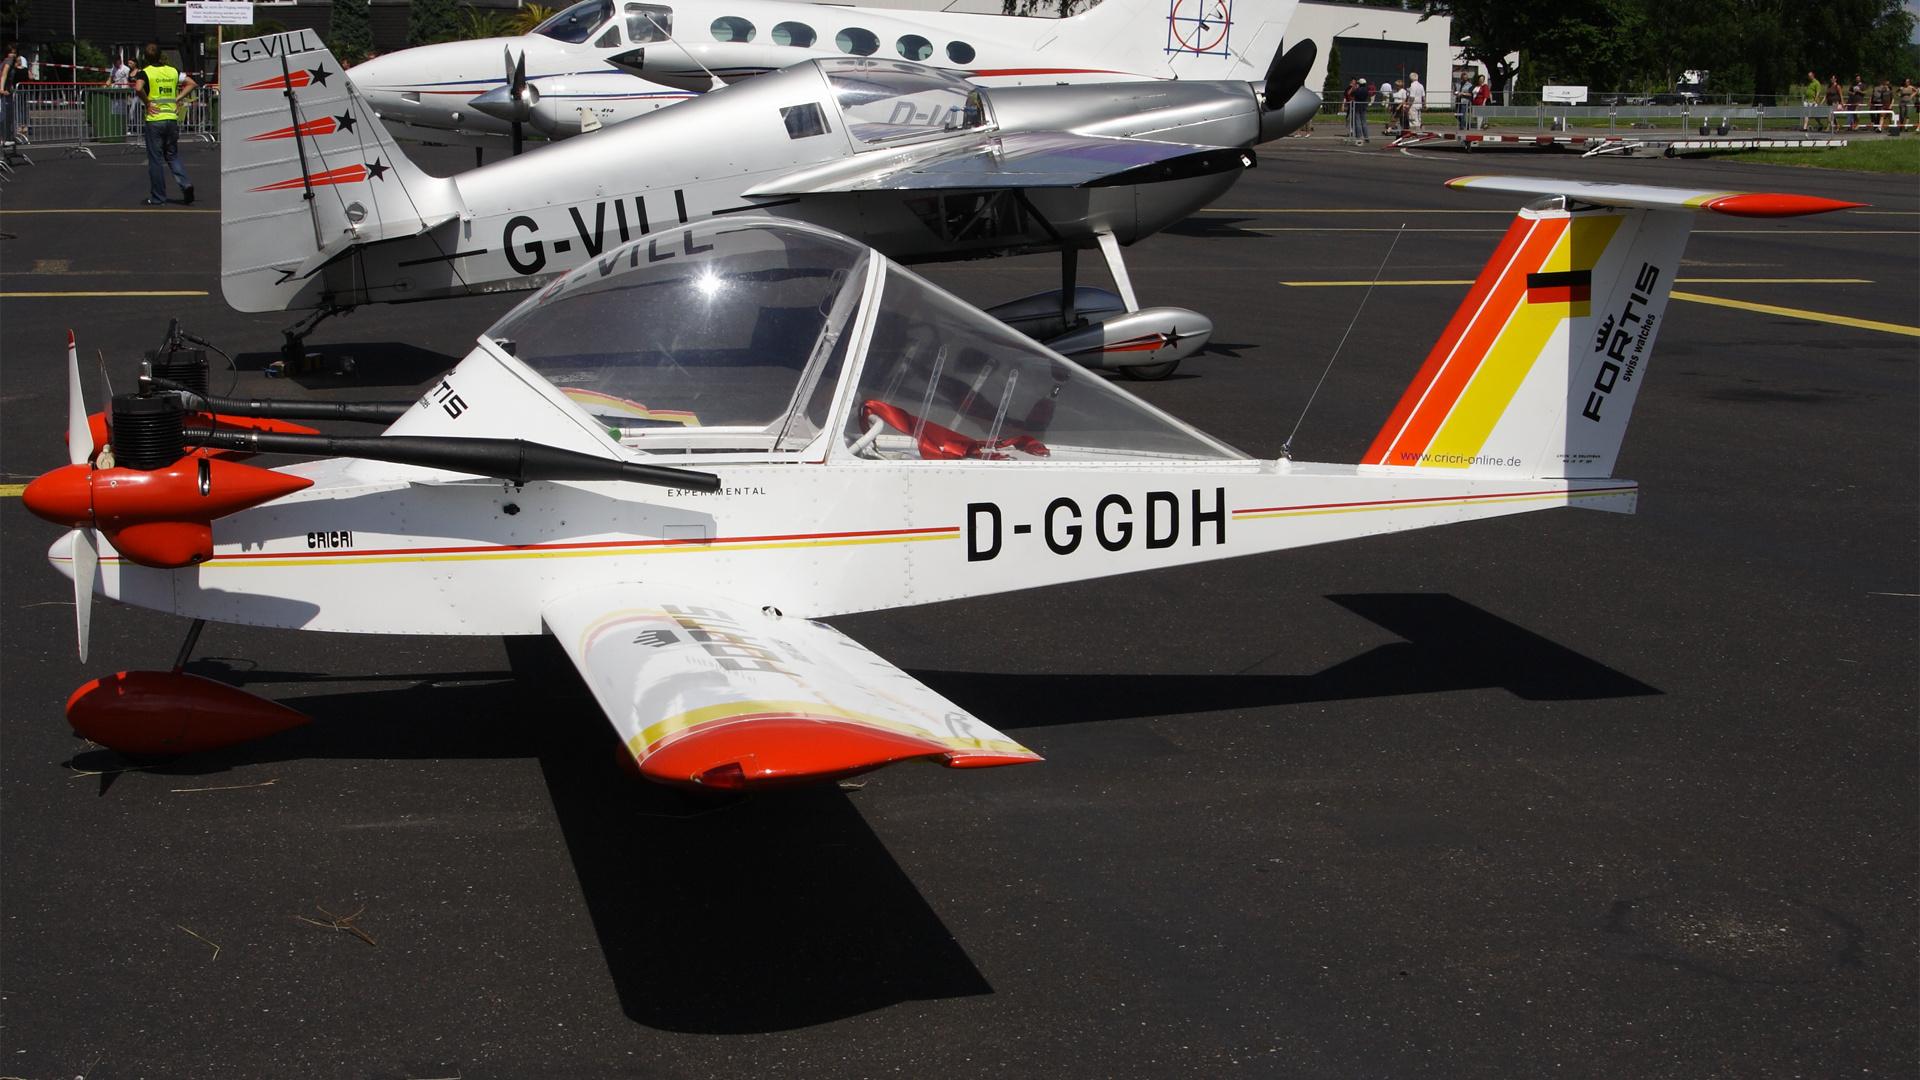 D-GGDH-1 CriCri  ESS 200806